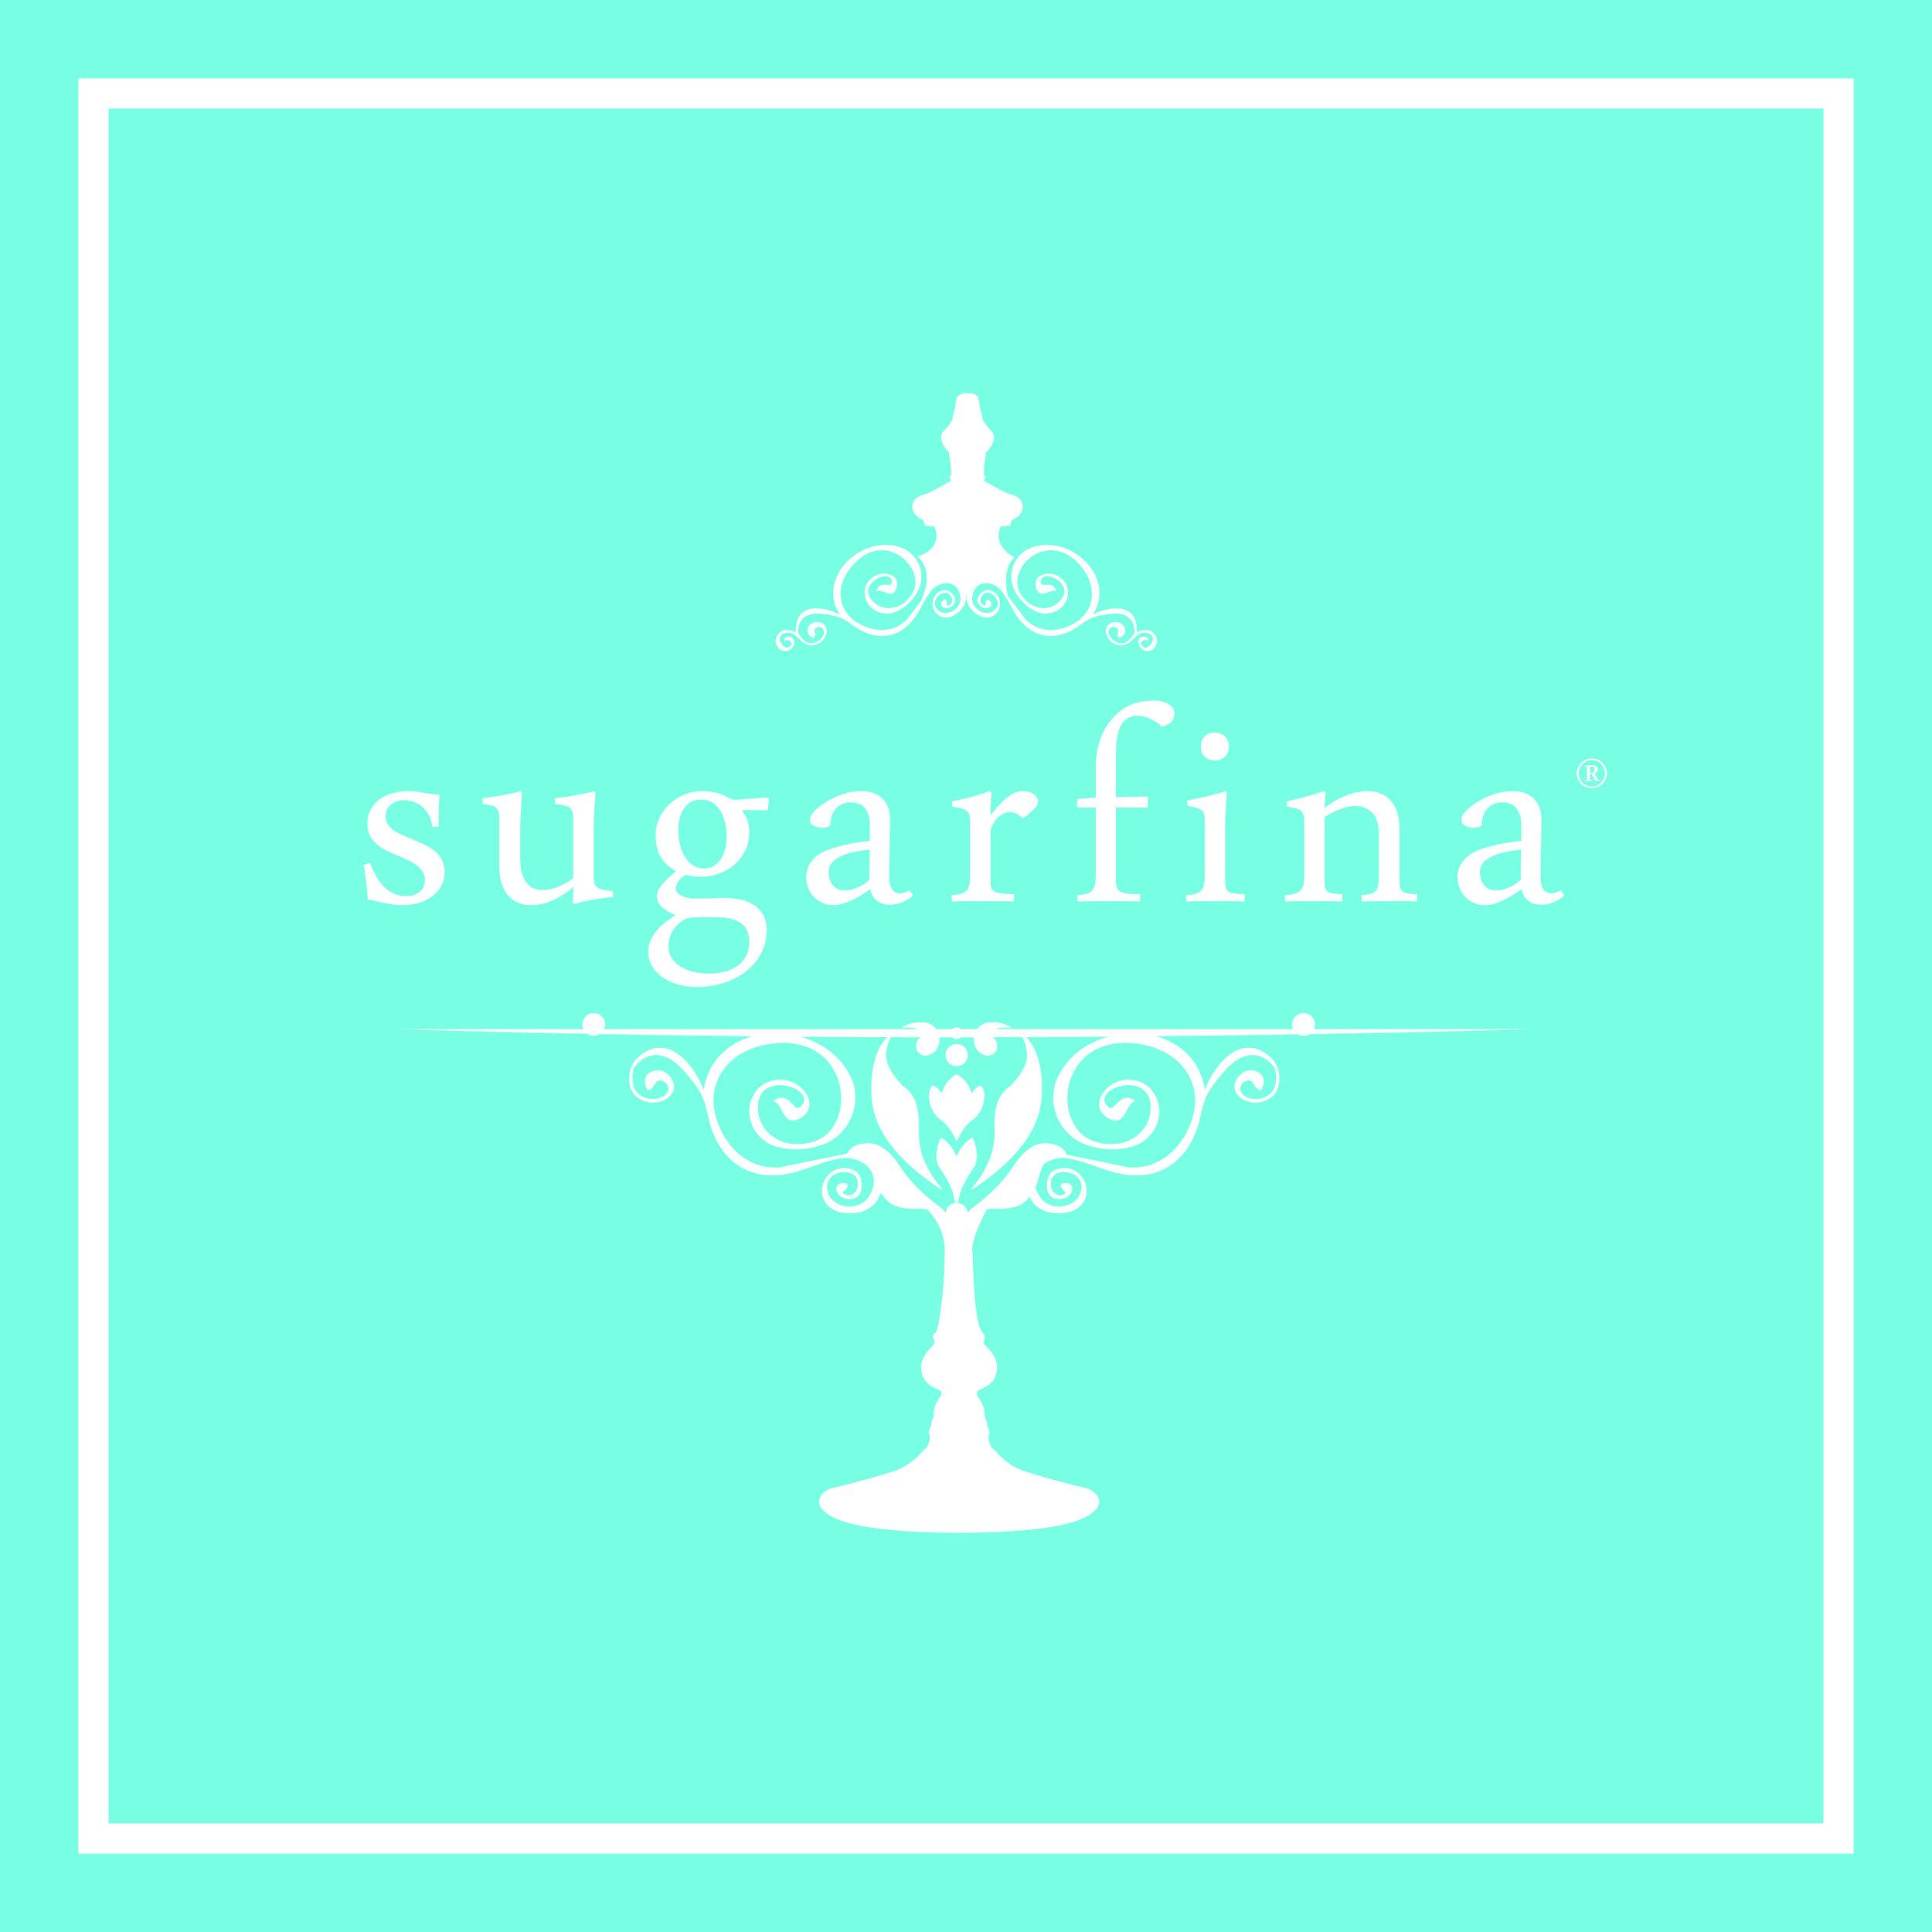 Sugarfina_square logo (1).jpg